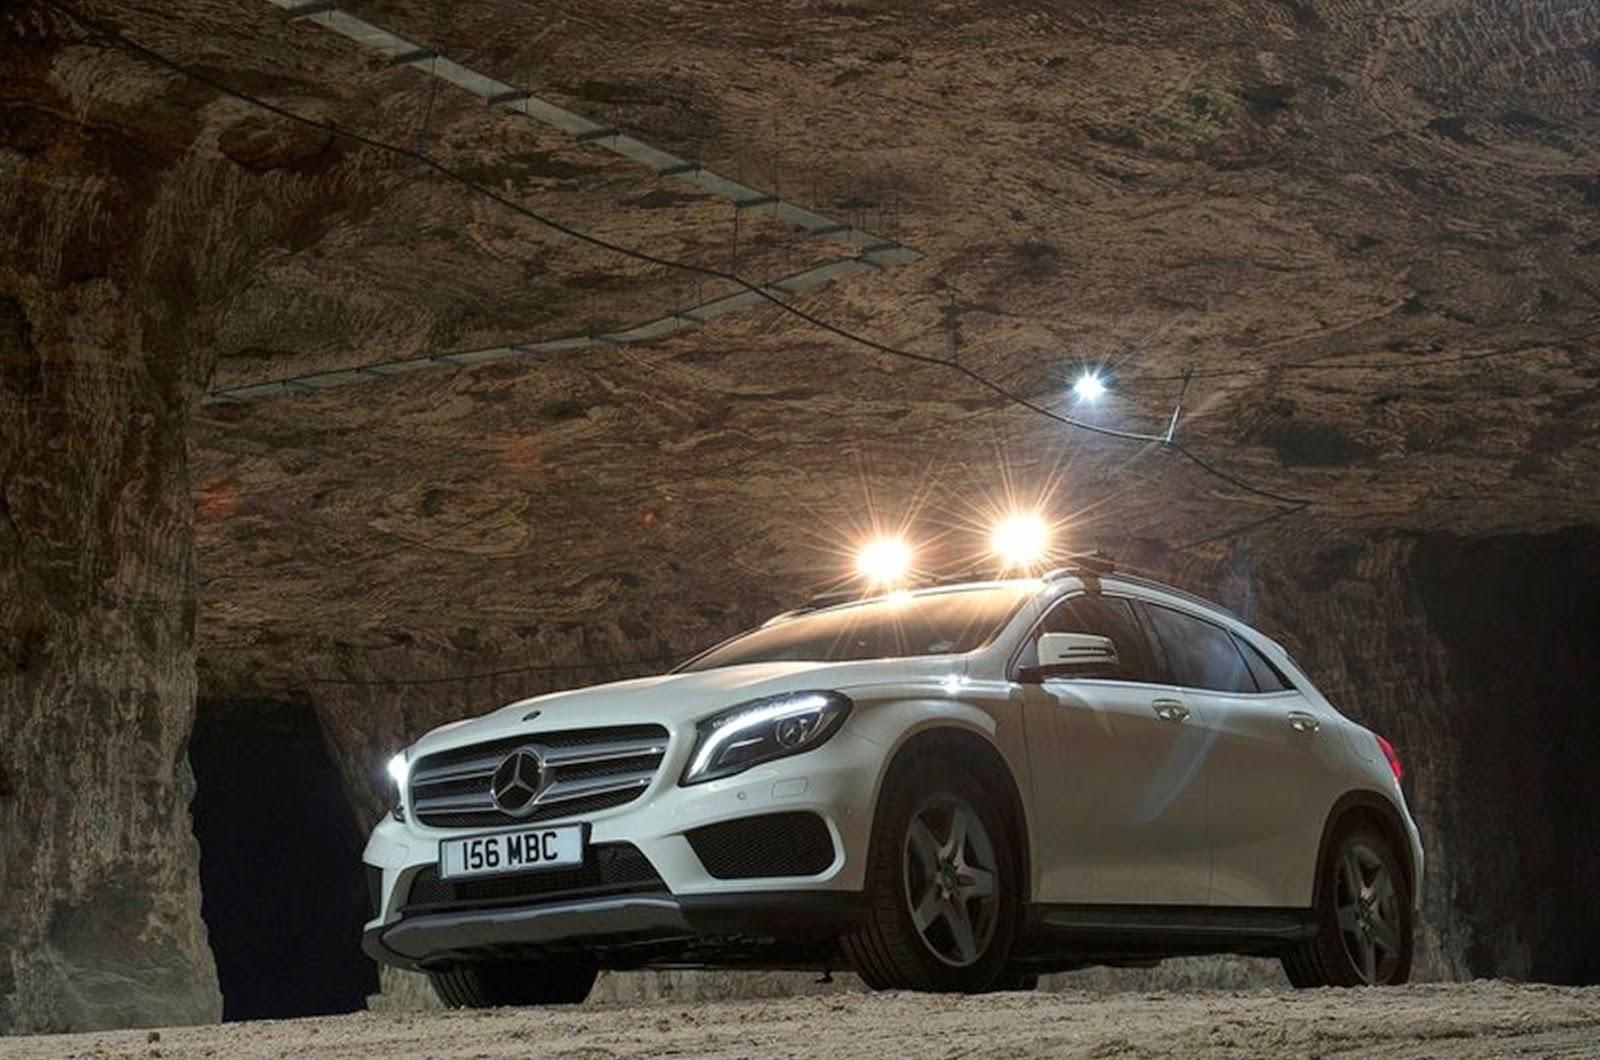 http://2.bp.blogspot.com/-k3pz96Pdb6M/U4q7H2FI5uI/AAAAAAAAK_E/OfPzgEoX_4Y/s1600/Carro-Mercedes-Benz-GLA_UK-Version_2015_wallpaper_car-+1800x1192.jpg